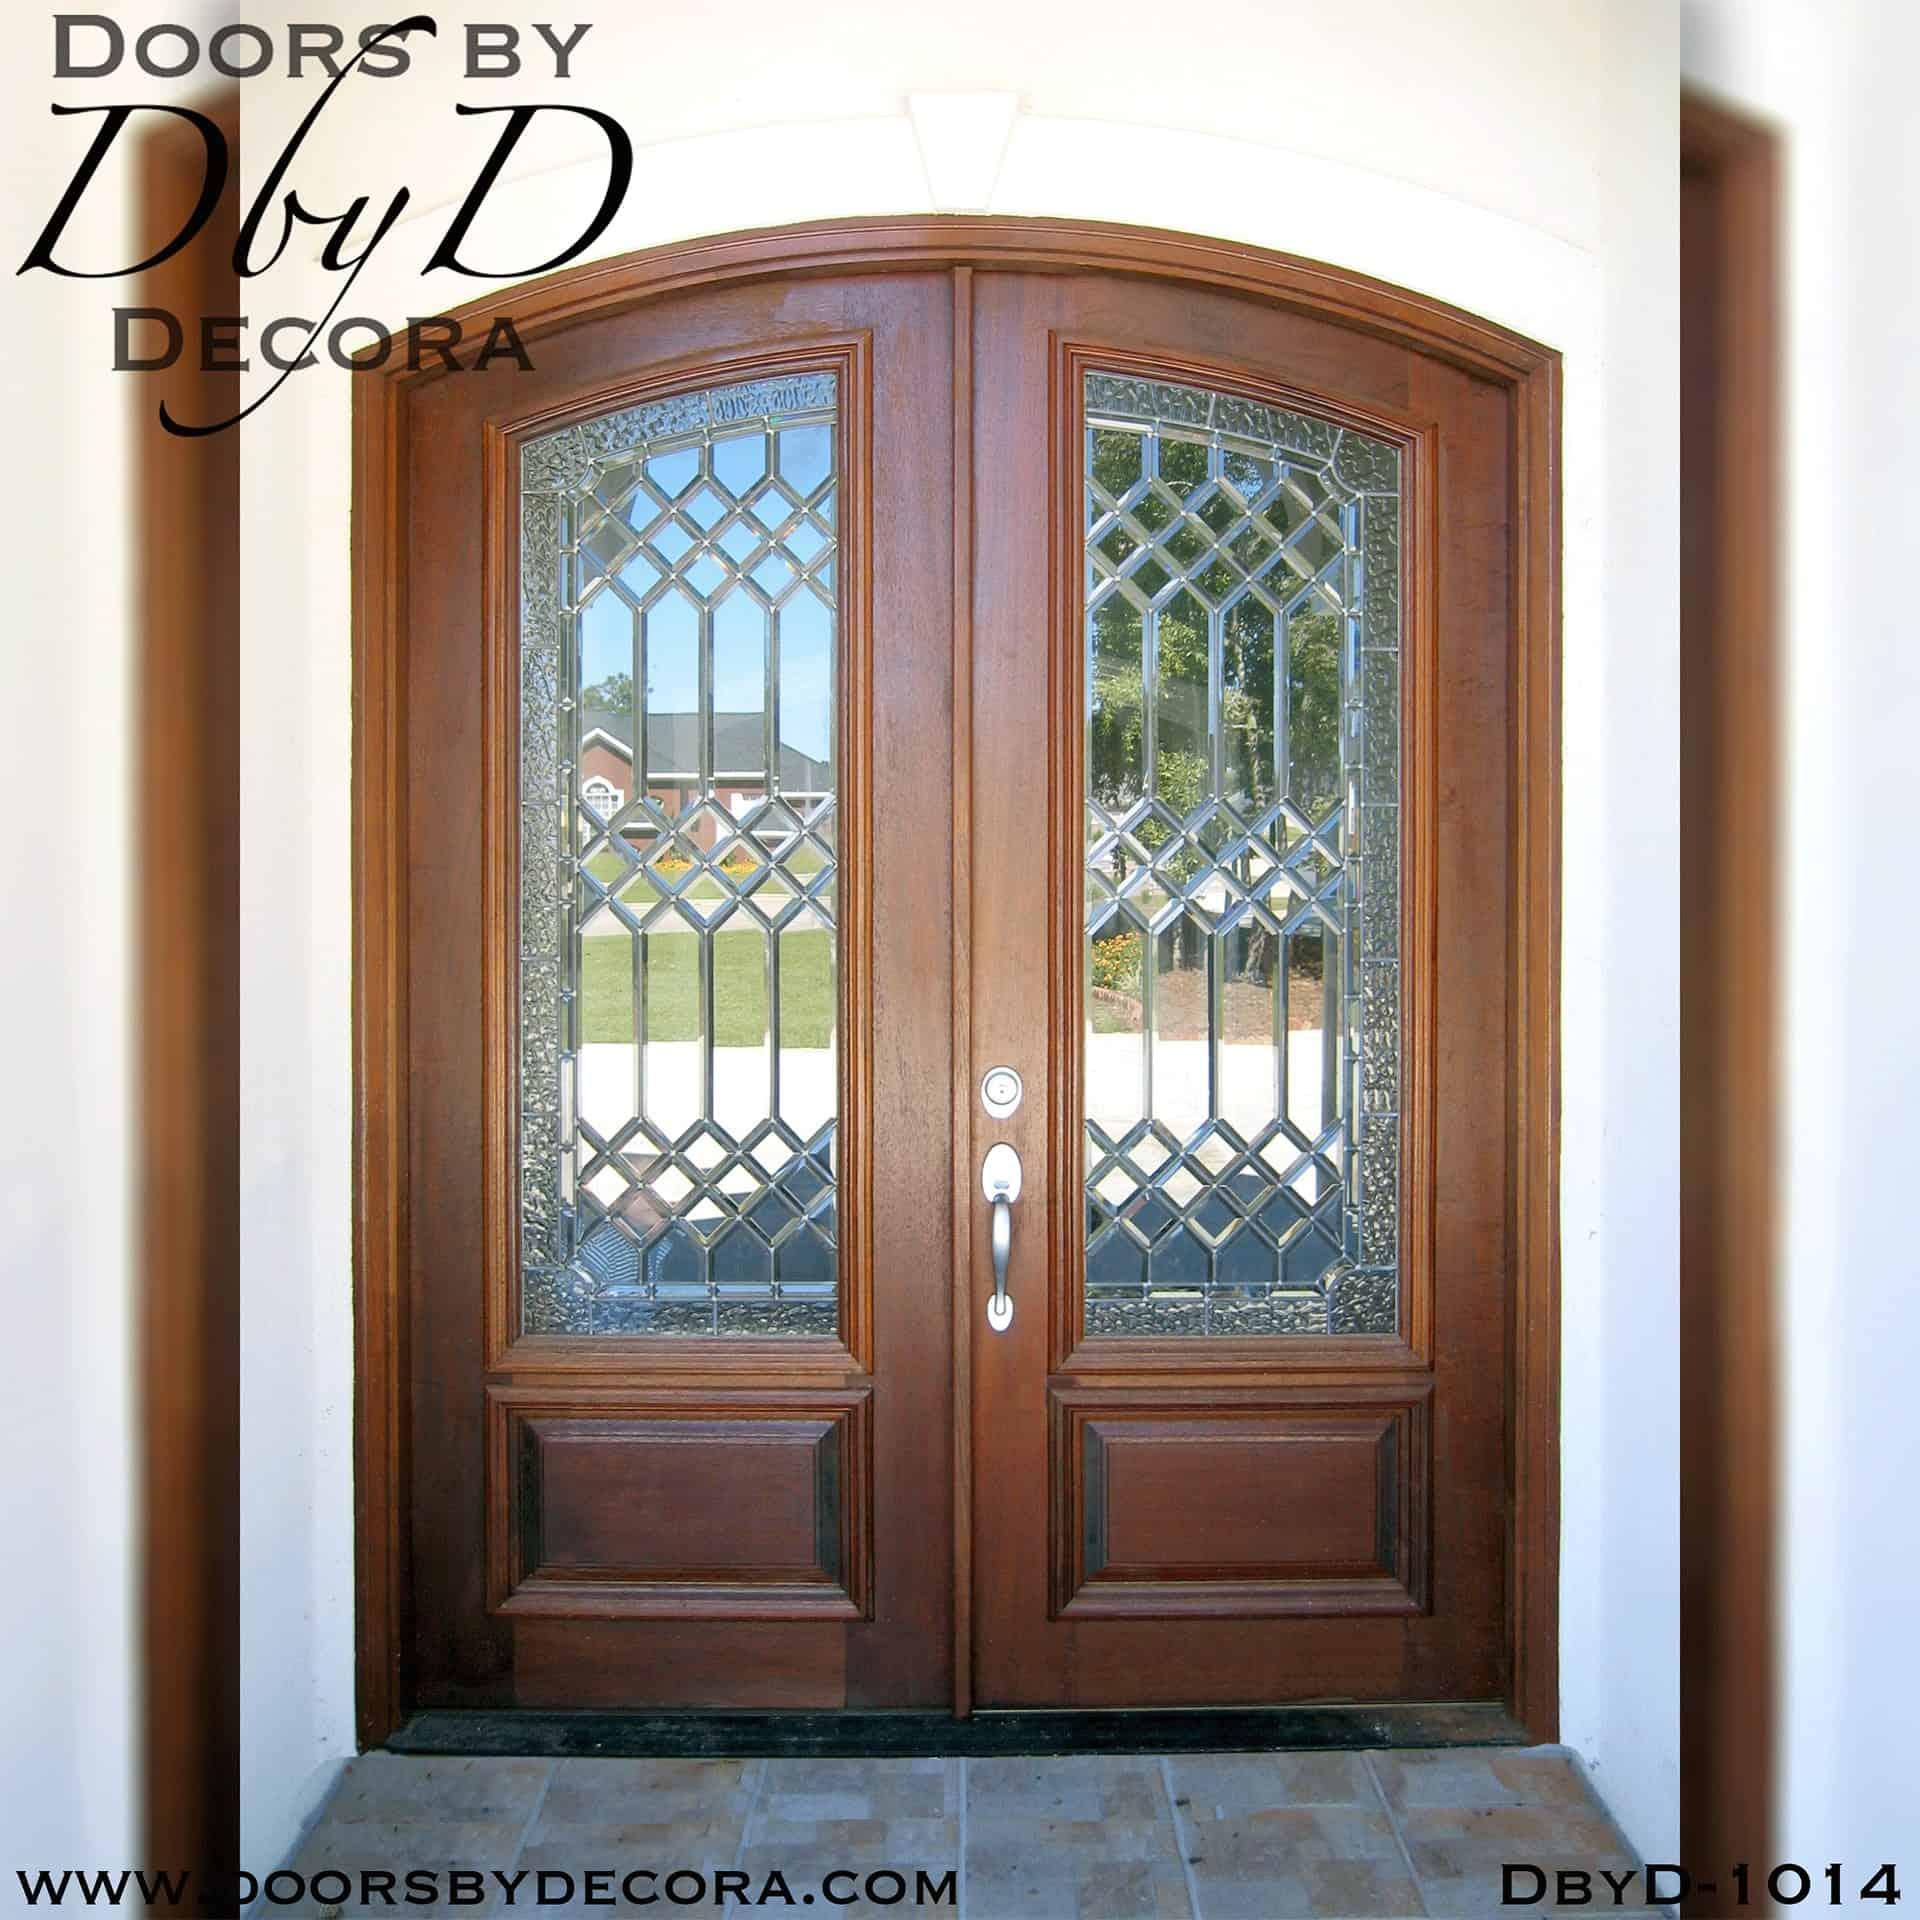 Custom Leaded Glass Double Door Solid Wood Entry Doors By Decora